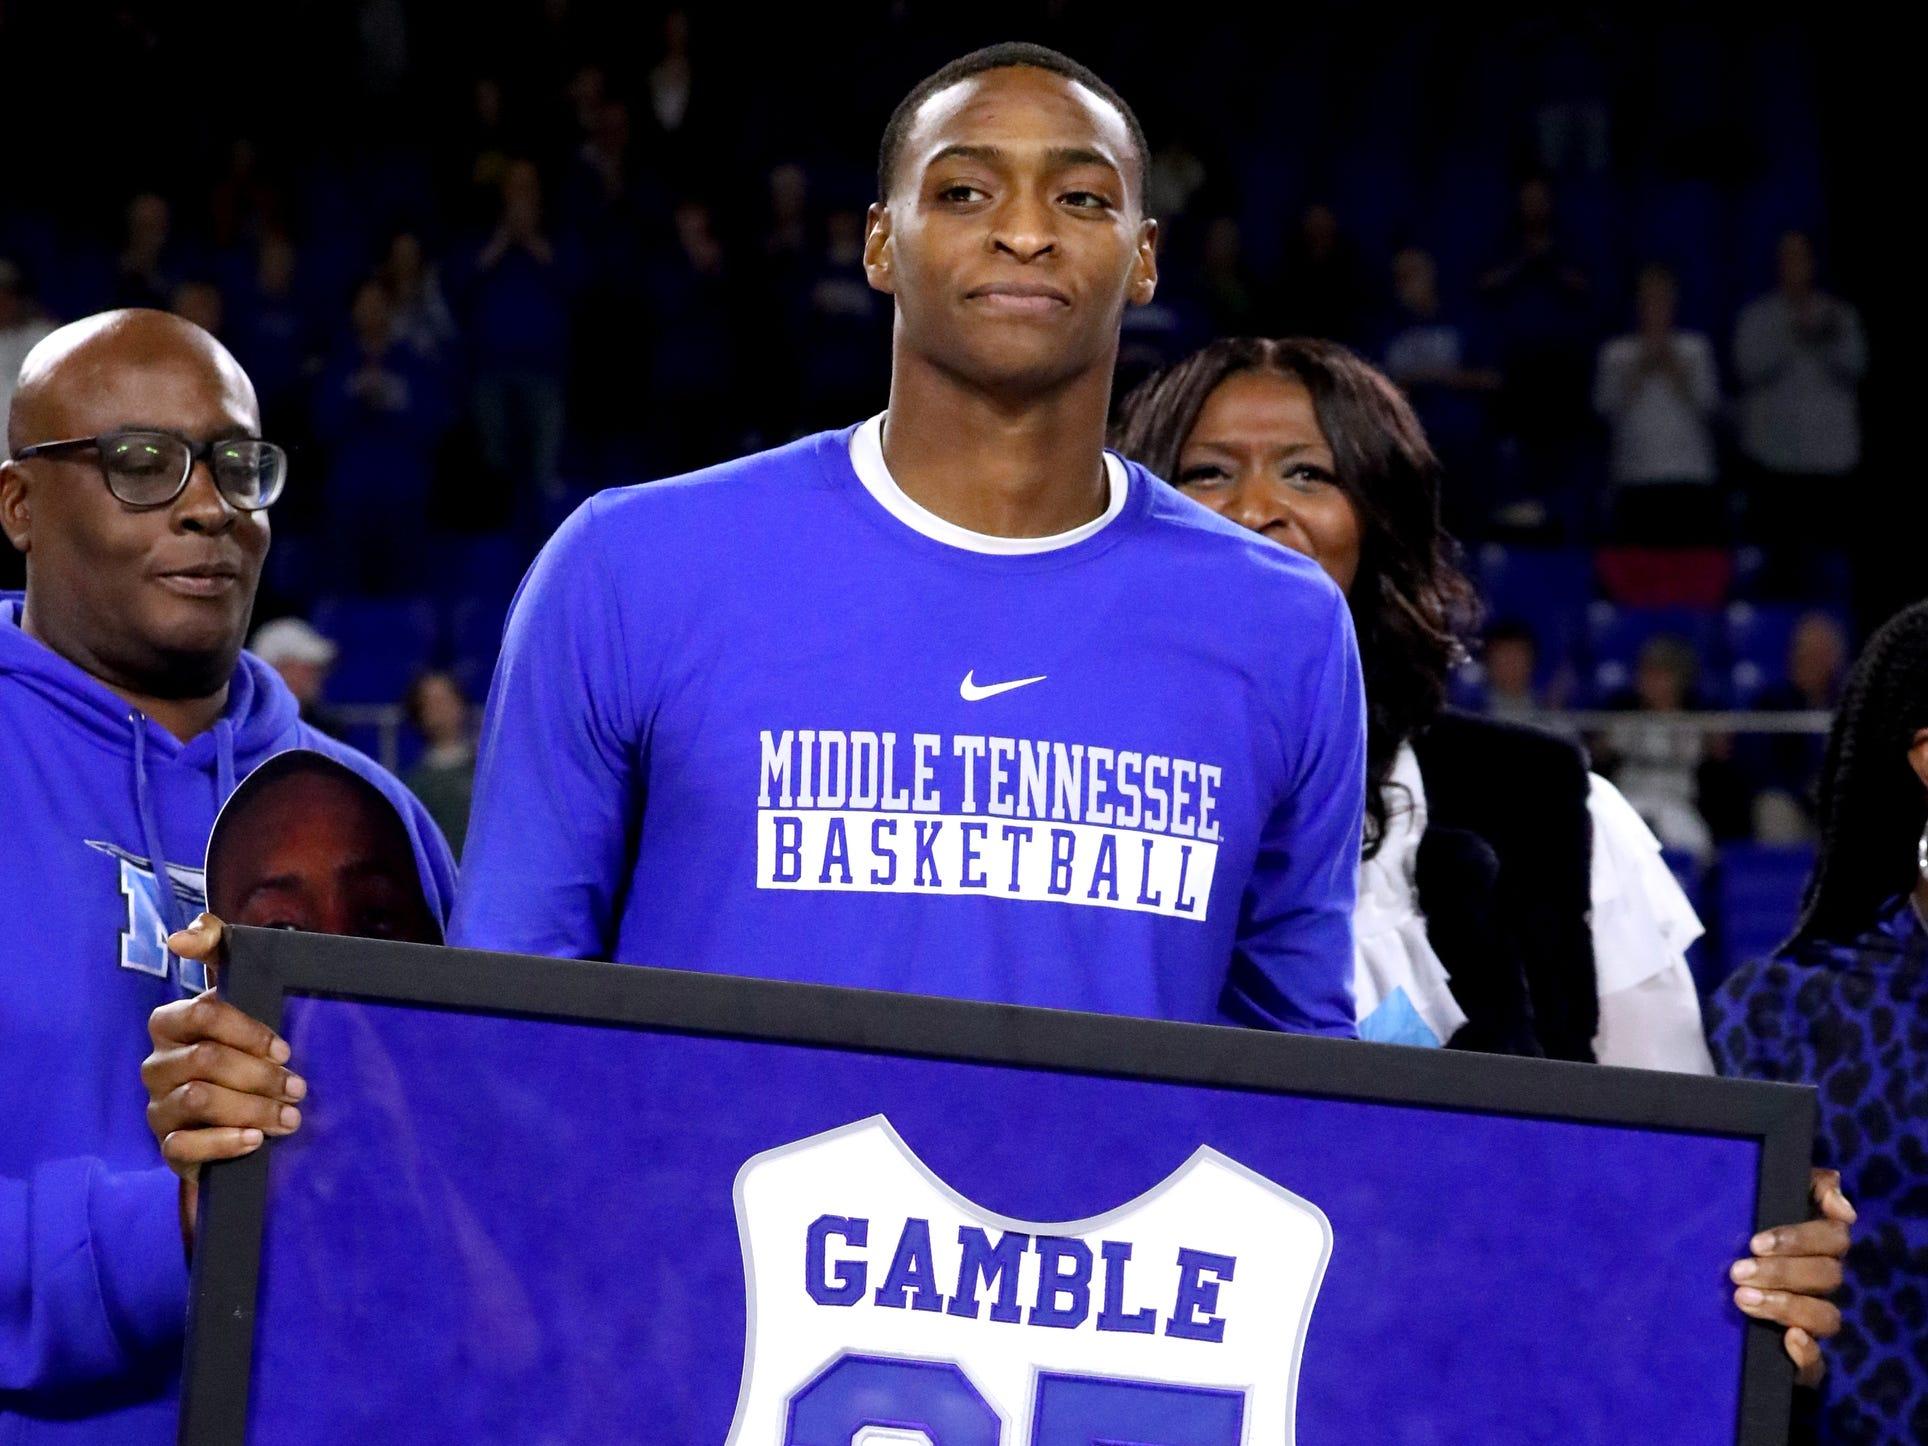 MTSU senior forward Karl Gamble (25) was honored during MTSU's senior night before the game against UTEP on Saturday, March 9, 2019, at Murphy Center in Murfreesboro, Tenn.